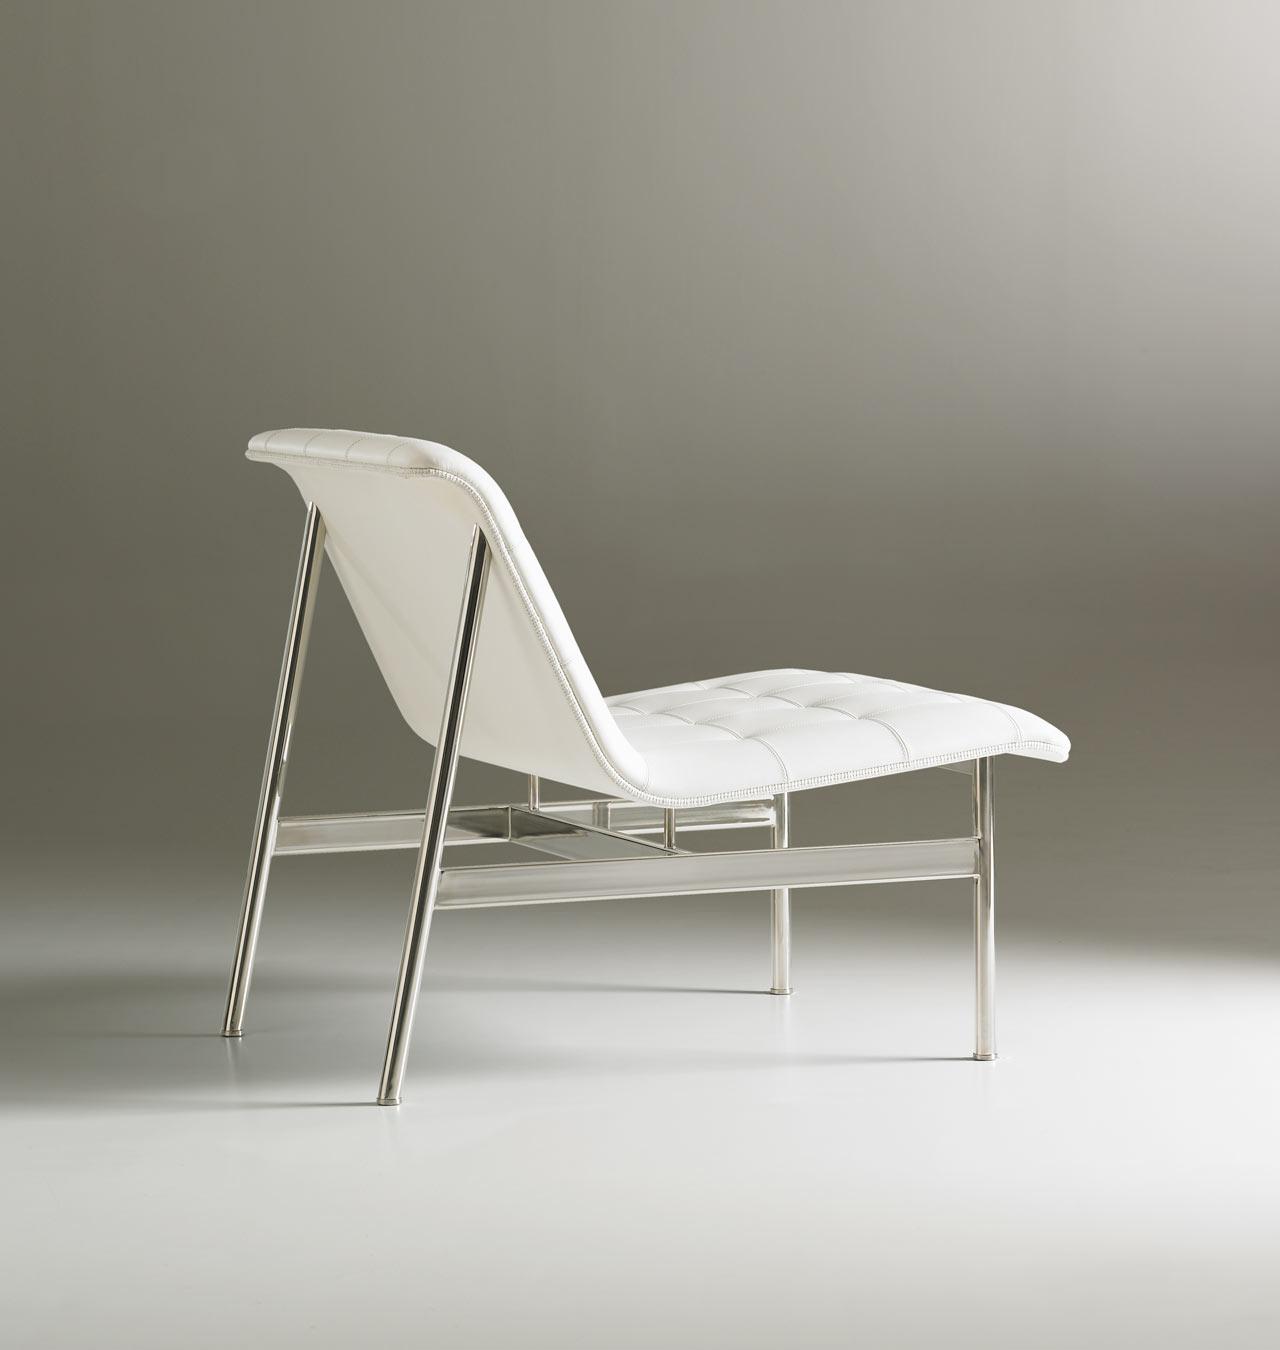 pollock-white-cp-lounge-bernhardt